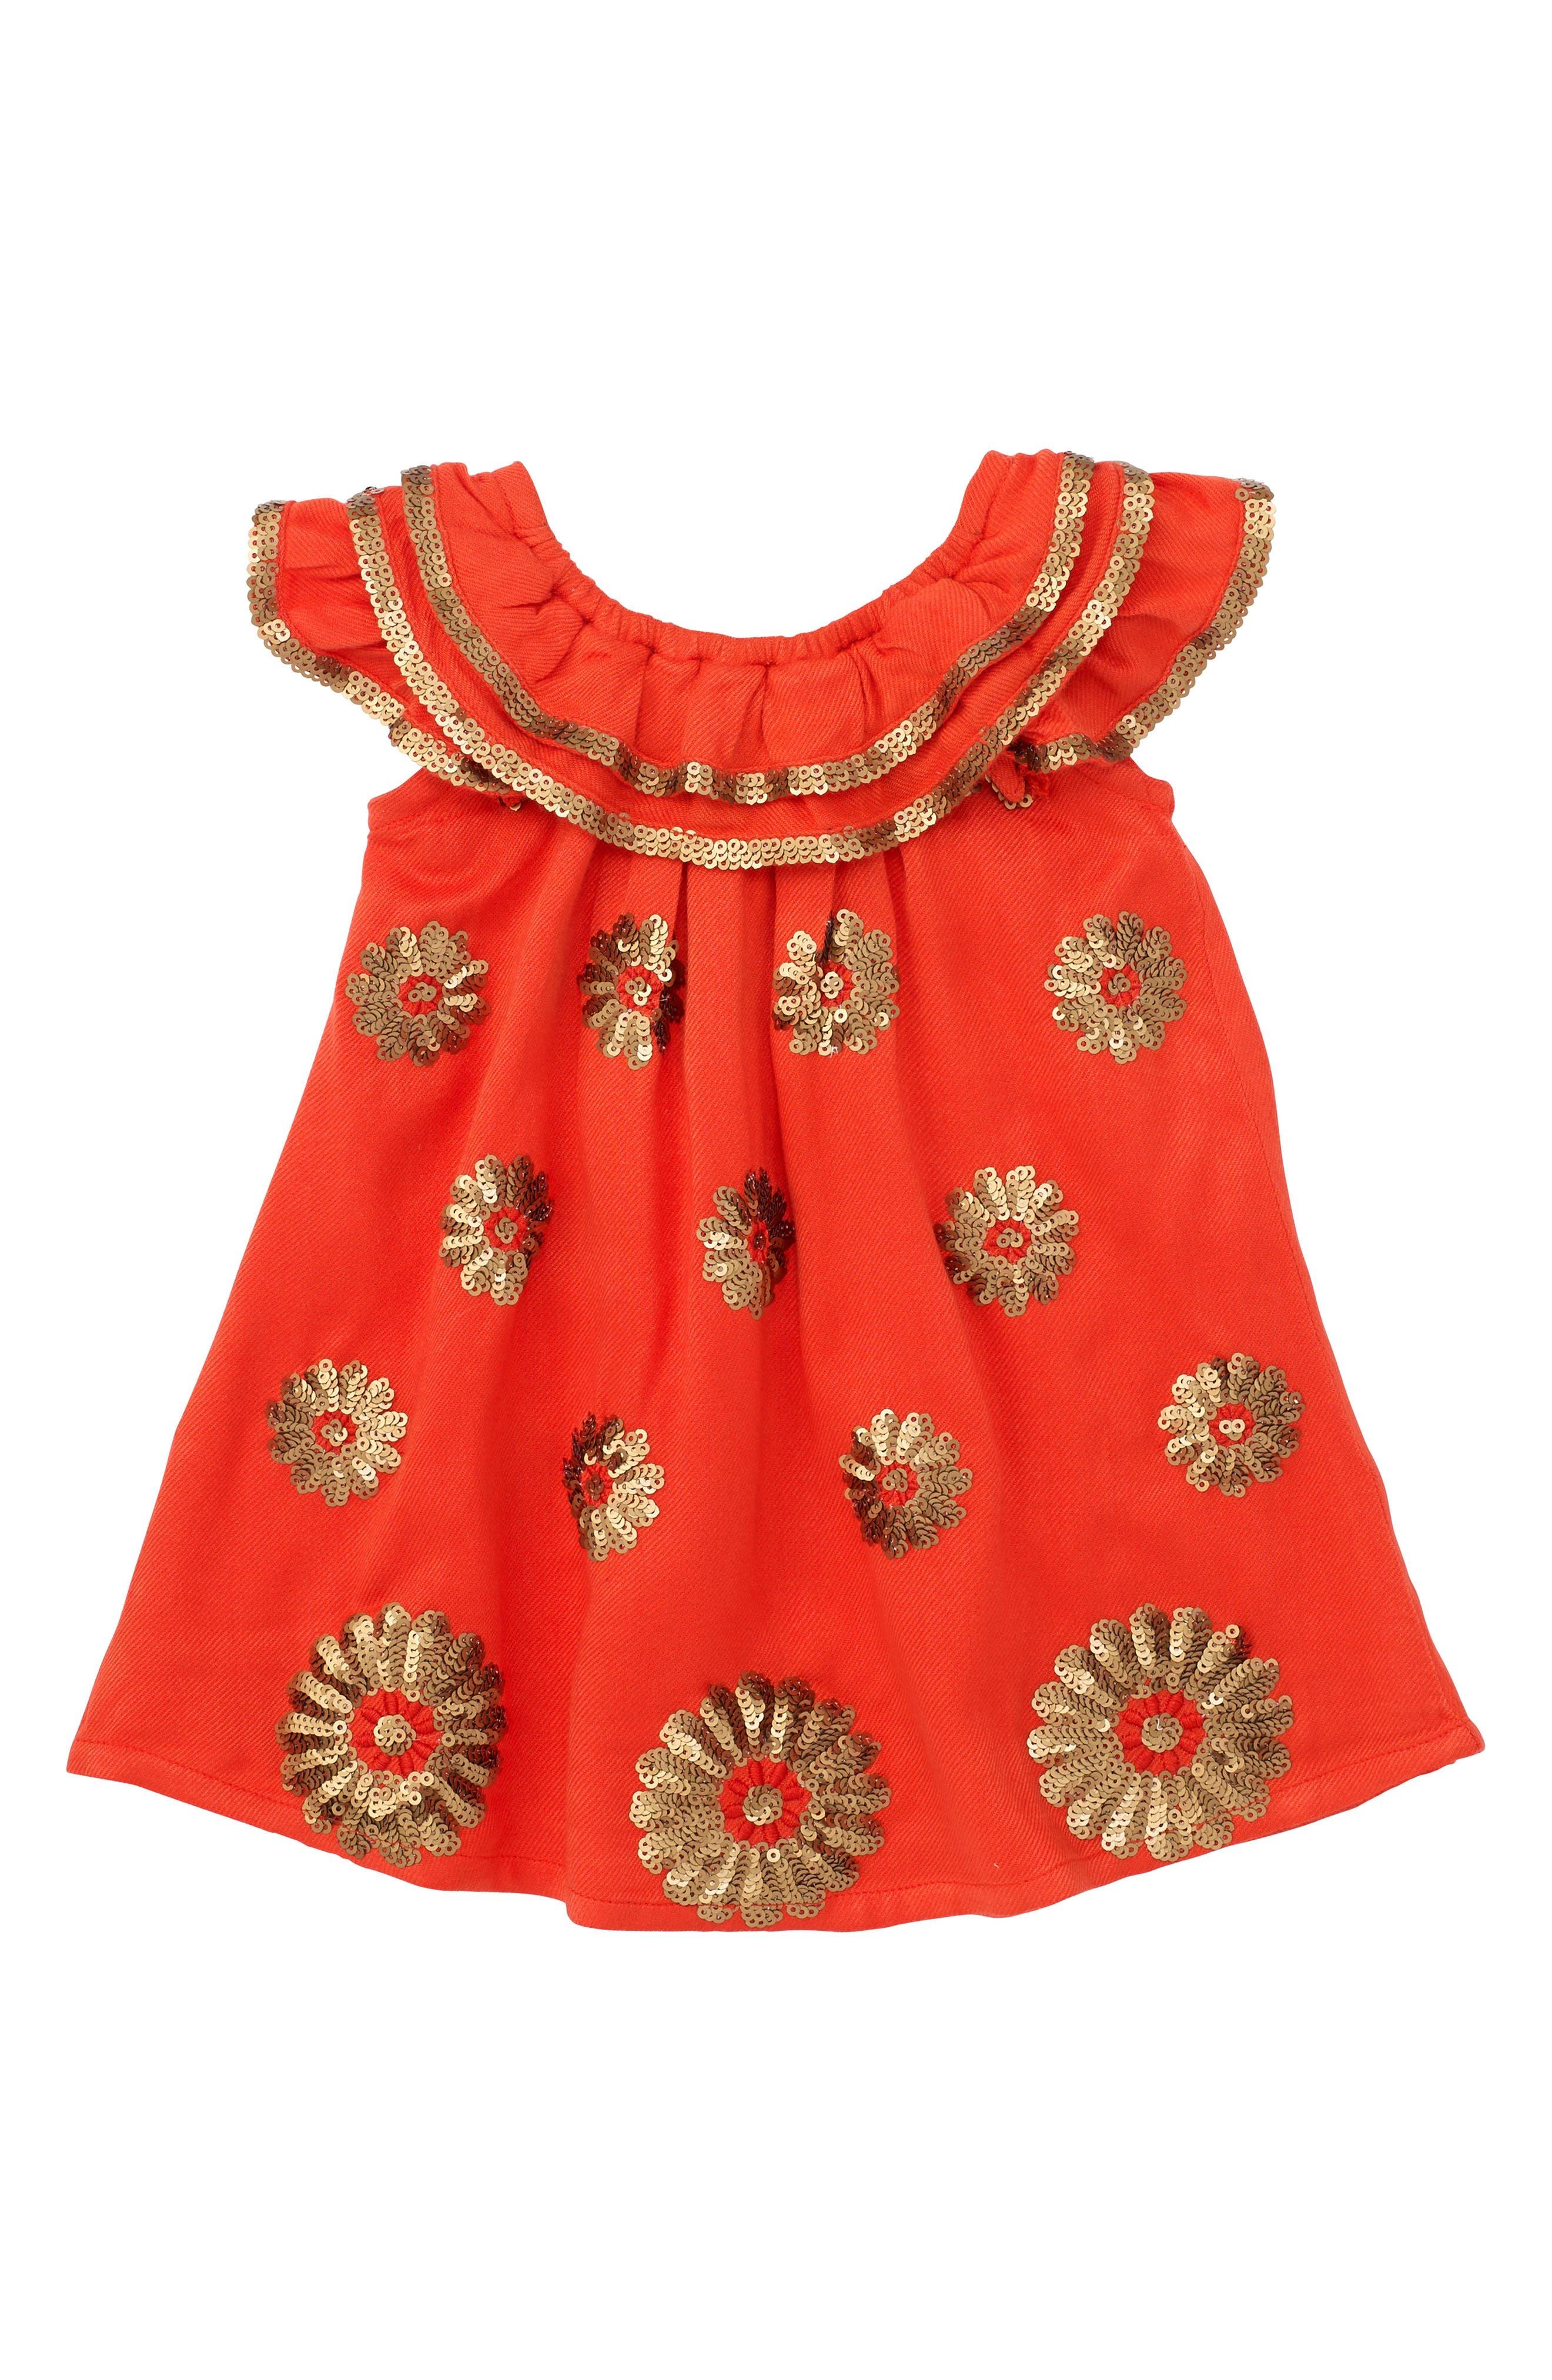 Dahlia Flutter Sleeve Dress,                             Main thumbnail 1, color,                             950